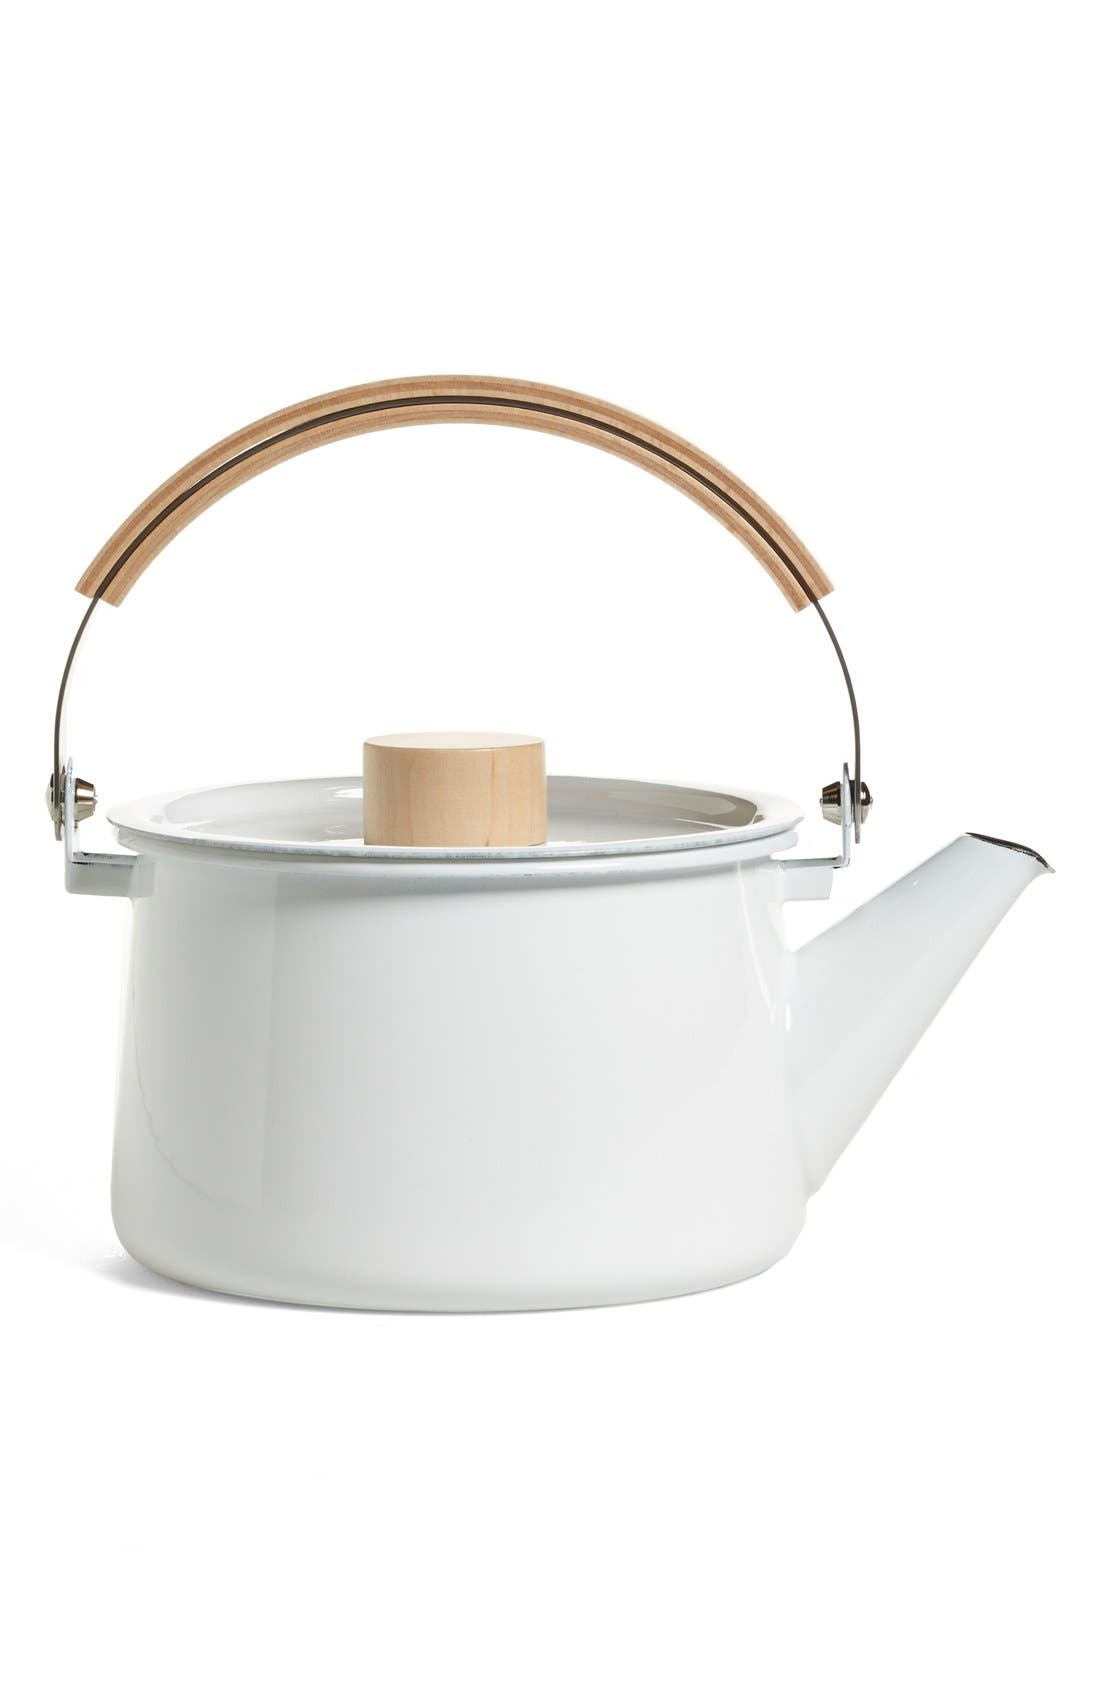 Main Image - saikai 'Kaico' Enameled Tea Kettle